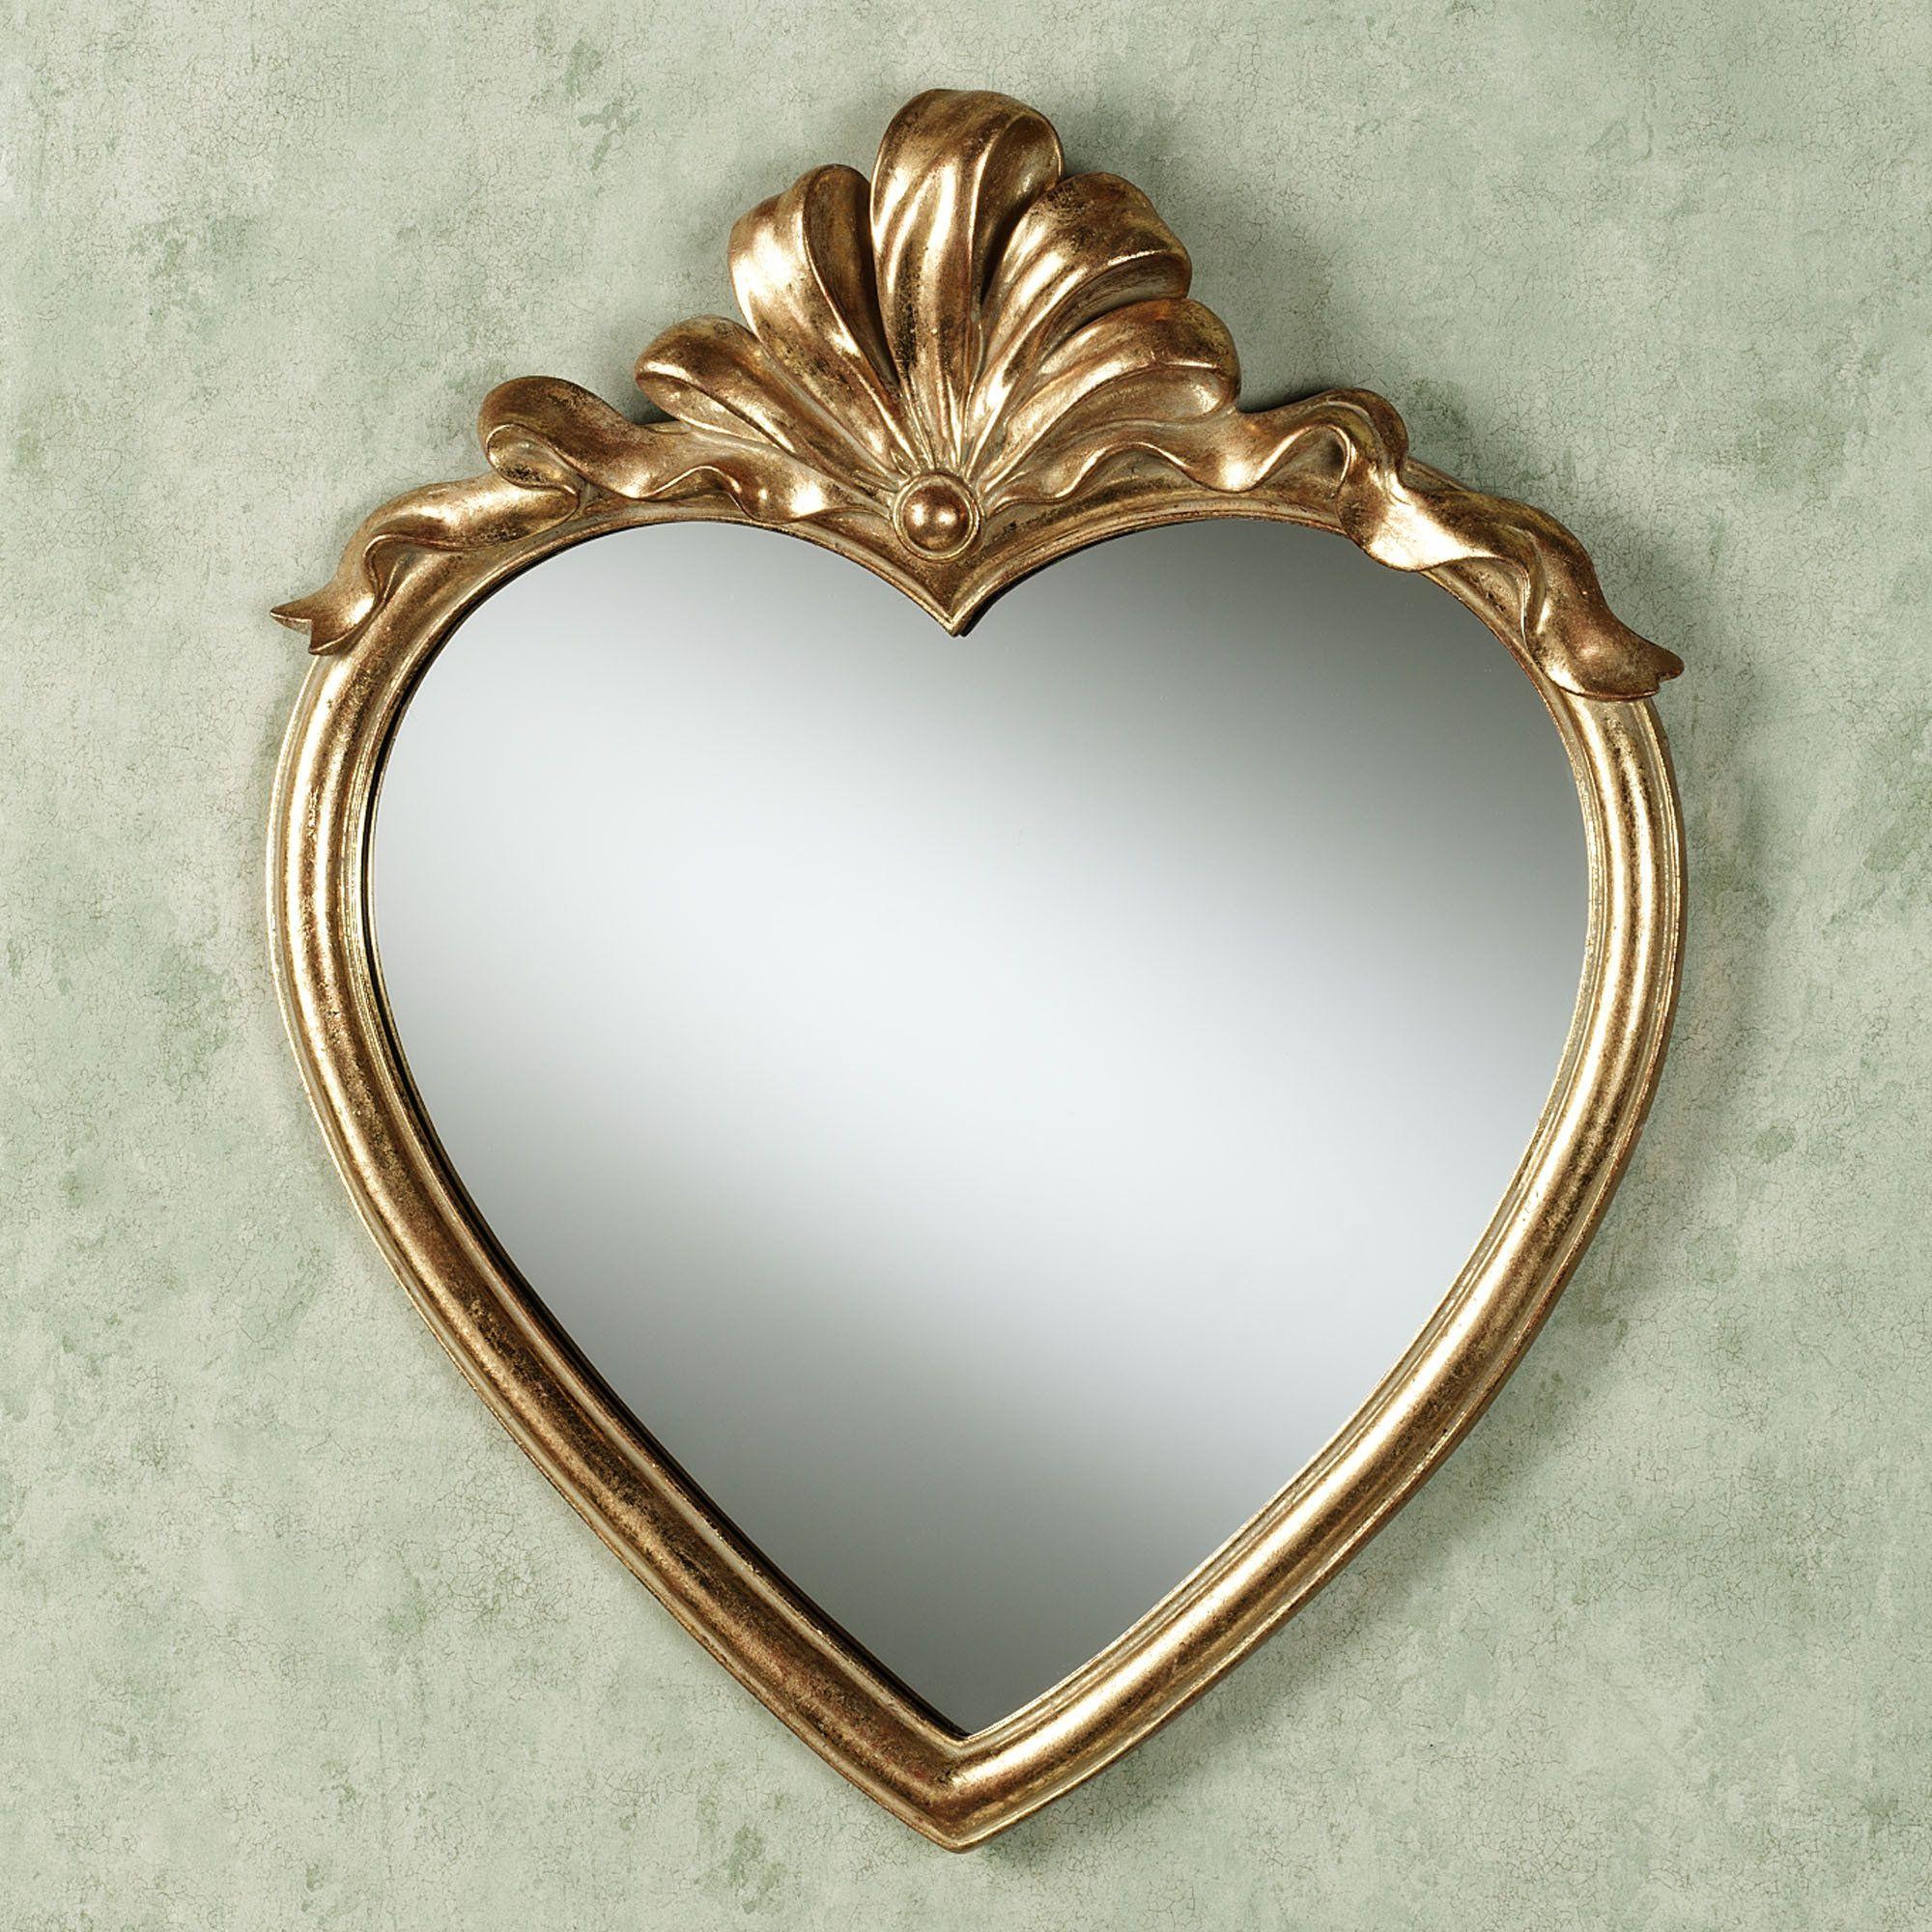 gold+framed+mirrors+wall+grouping | Karessa Heart Wall ...